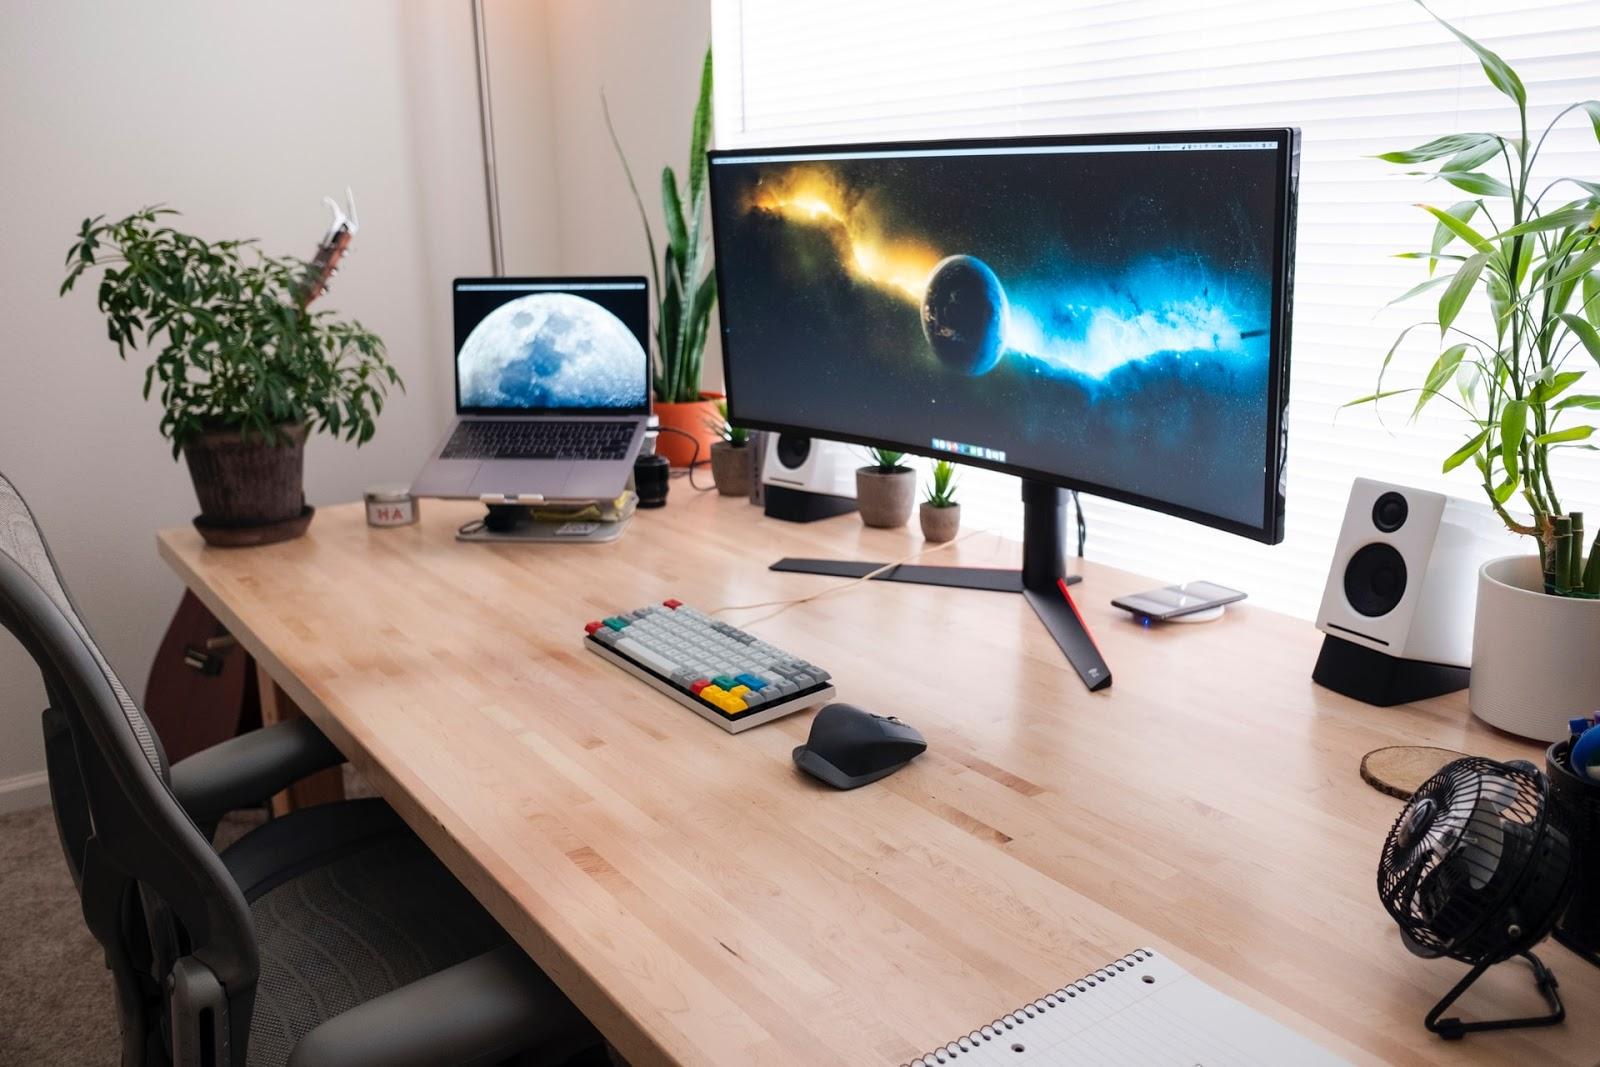 workstation, workstation optimization, how to optimize workstation, web development, web devices, computers, laptops, speakers, mouse and keyboard, web design